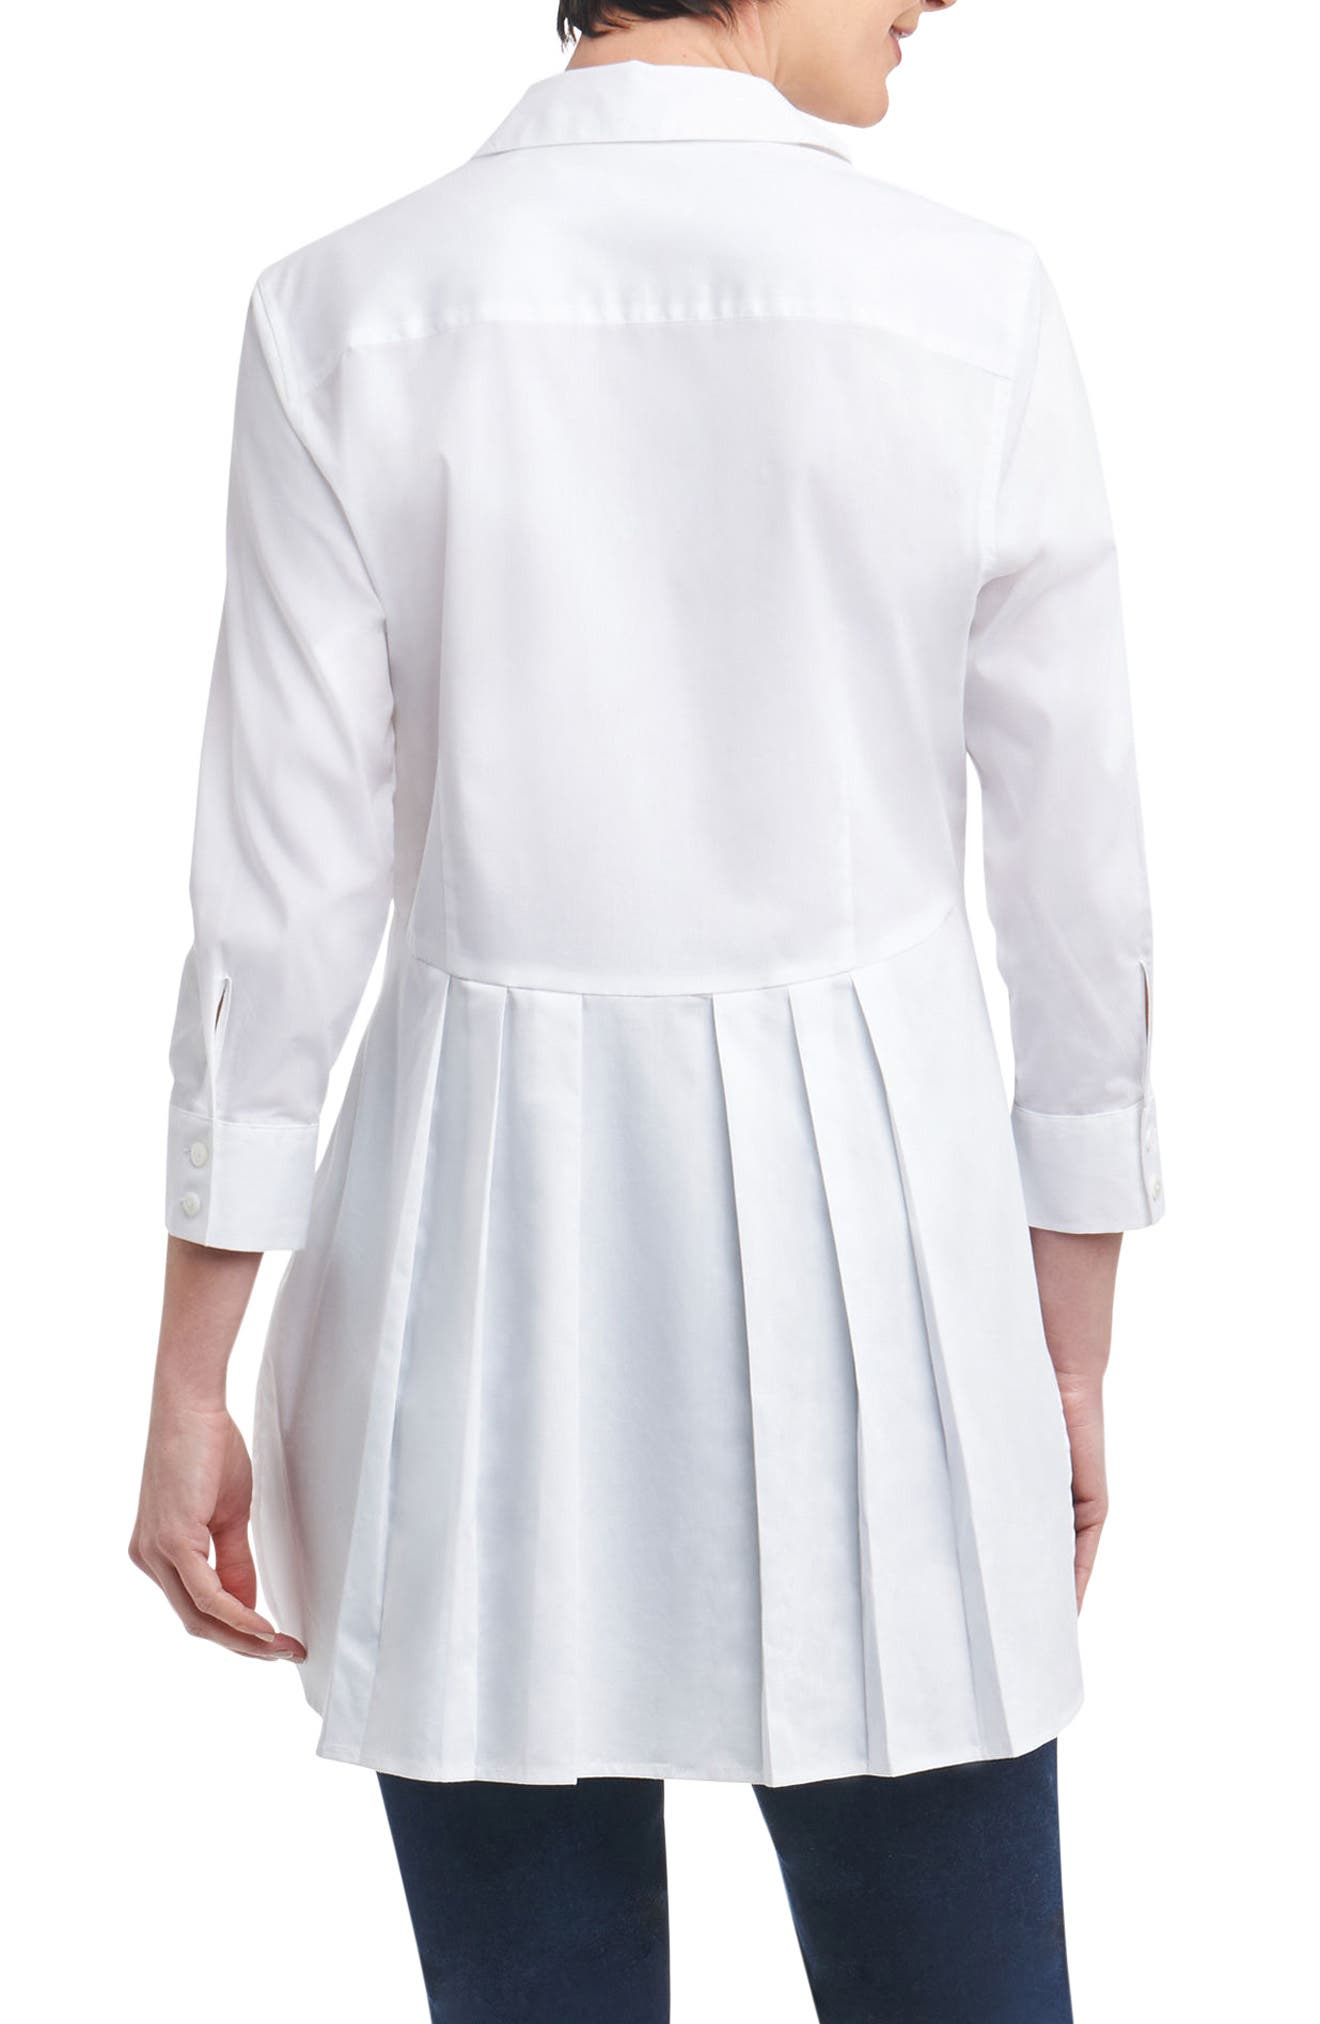 Gwen Stretch Tunic Shirt,                             Alternate thumbnail 2, color,